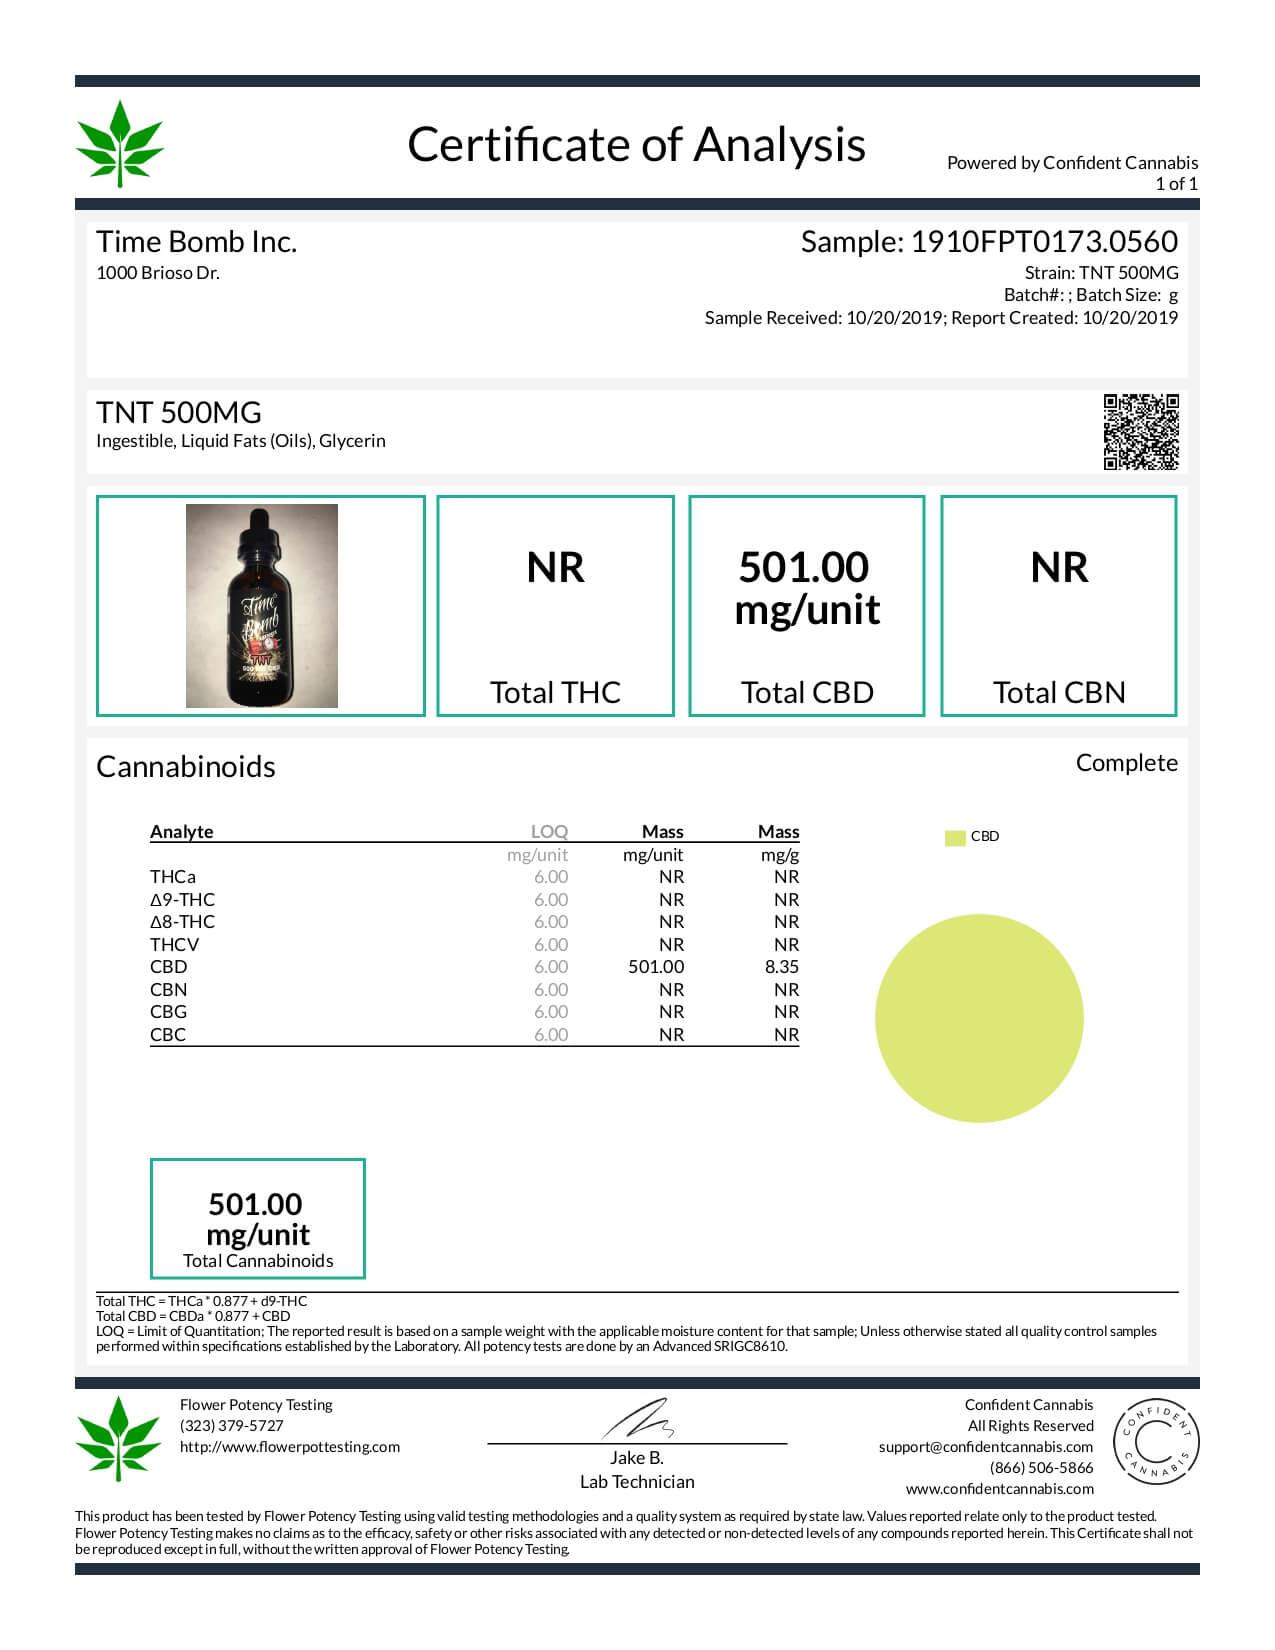 Time Bomb Extracts CBD Vape Juice TNT 500mg Lab Report